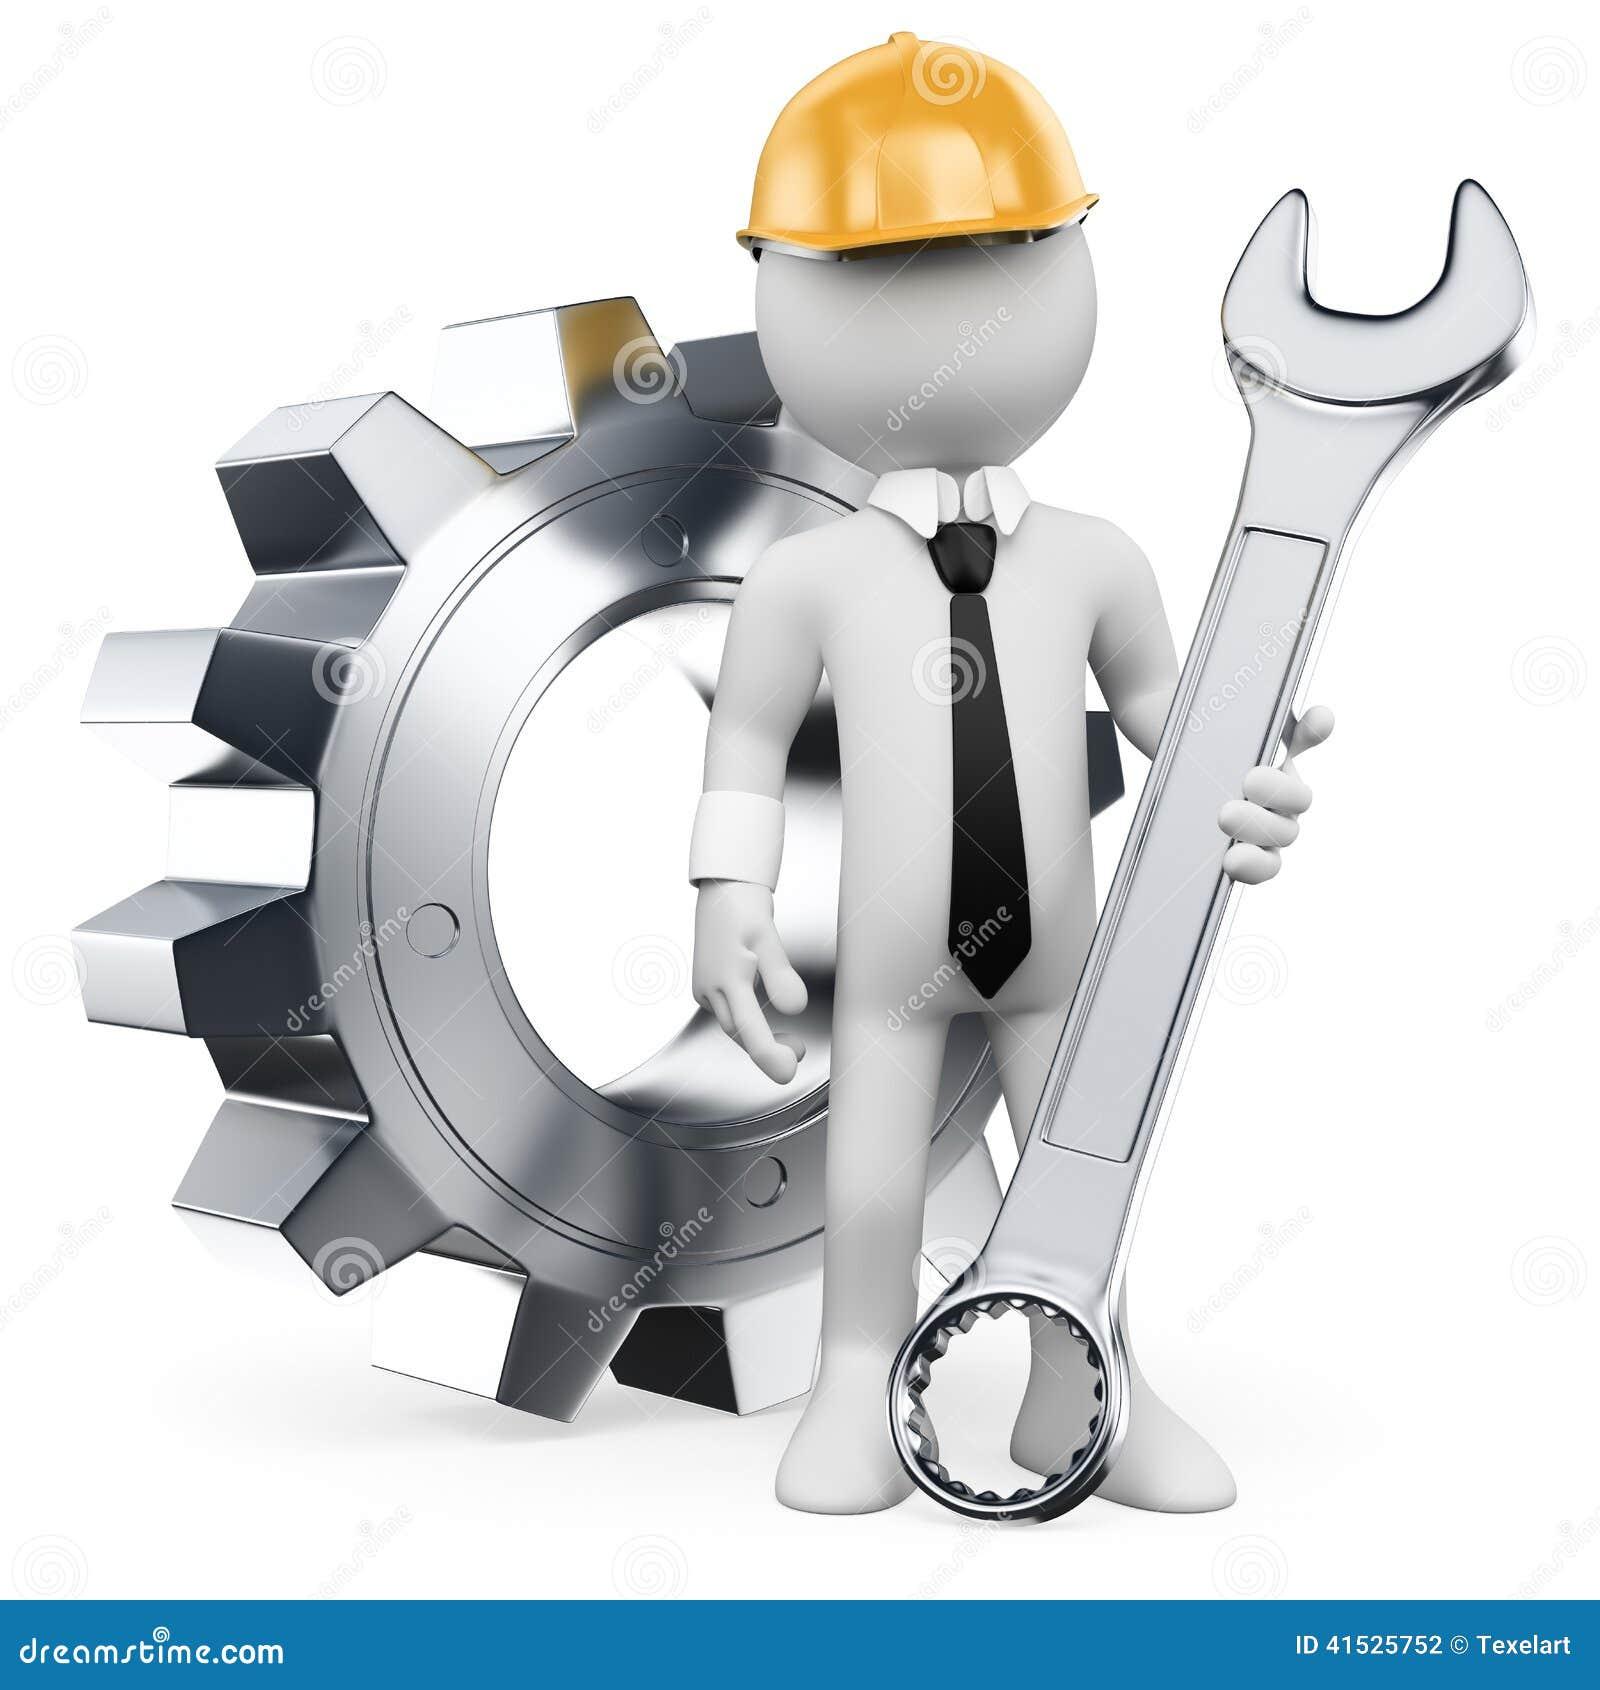 Mechanical Engineer Royalty Free Stock Photos - Image: 29186038